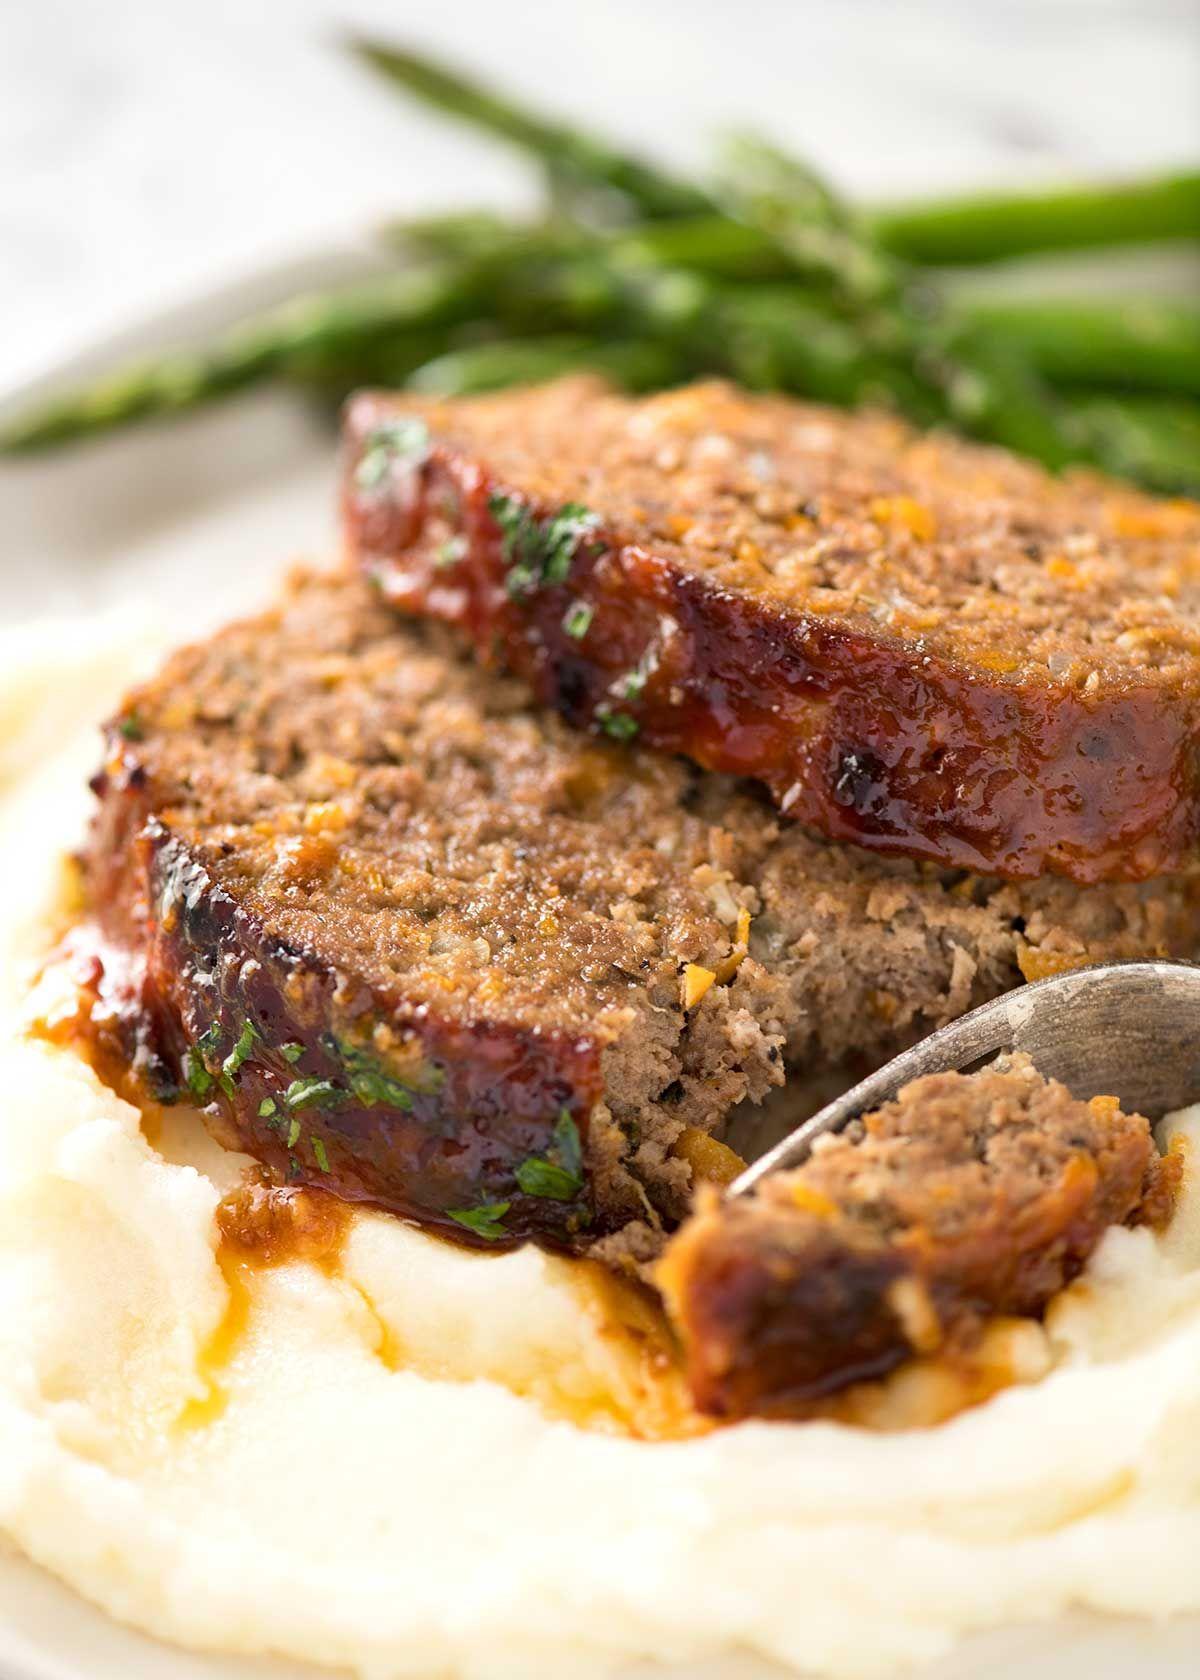 Meatloaf Recipe Extra Delicious Recipe Meatloaf Recipes Recipes Meatloaf